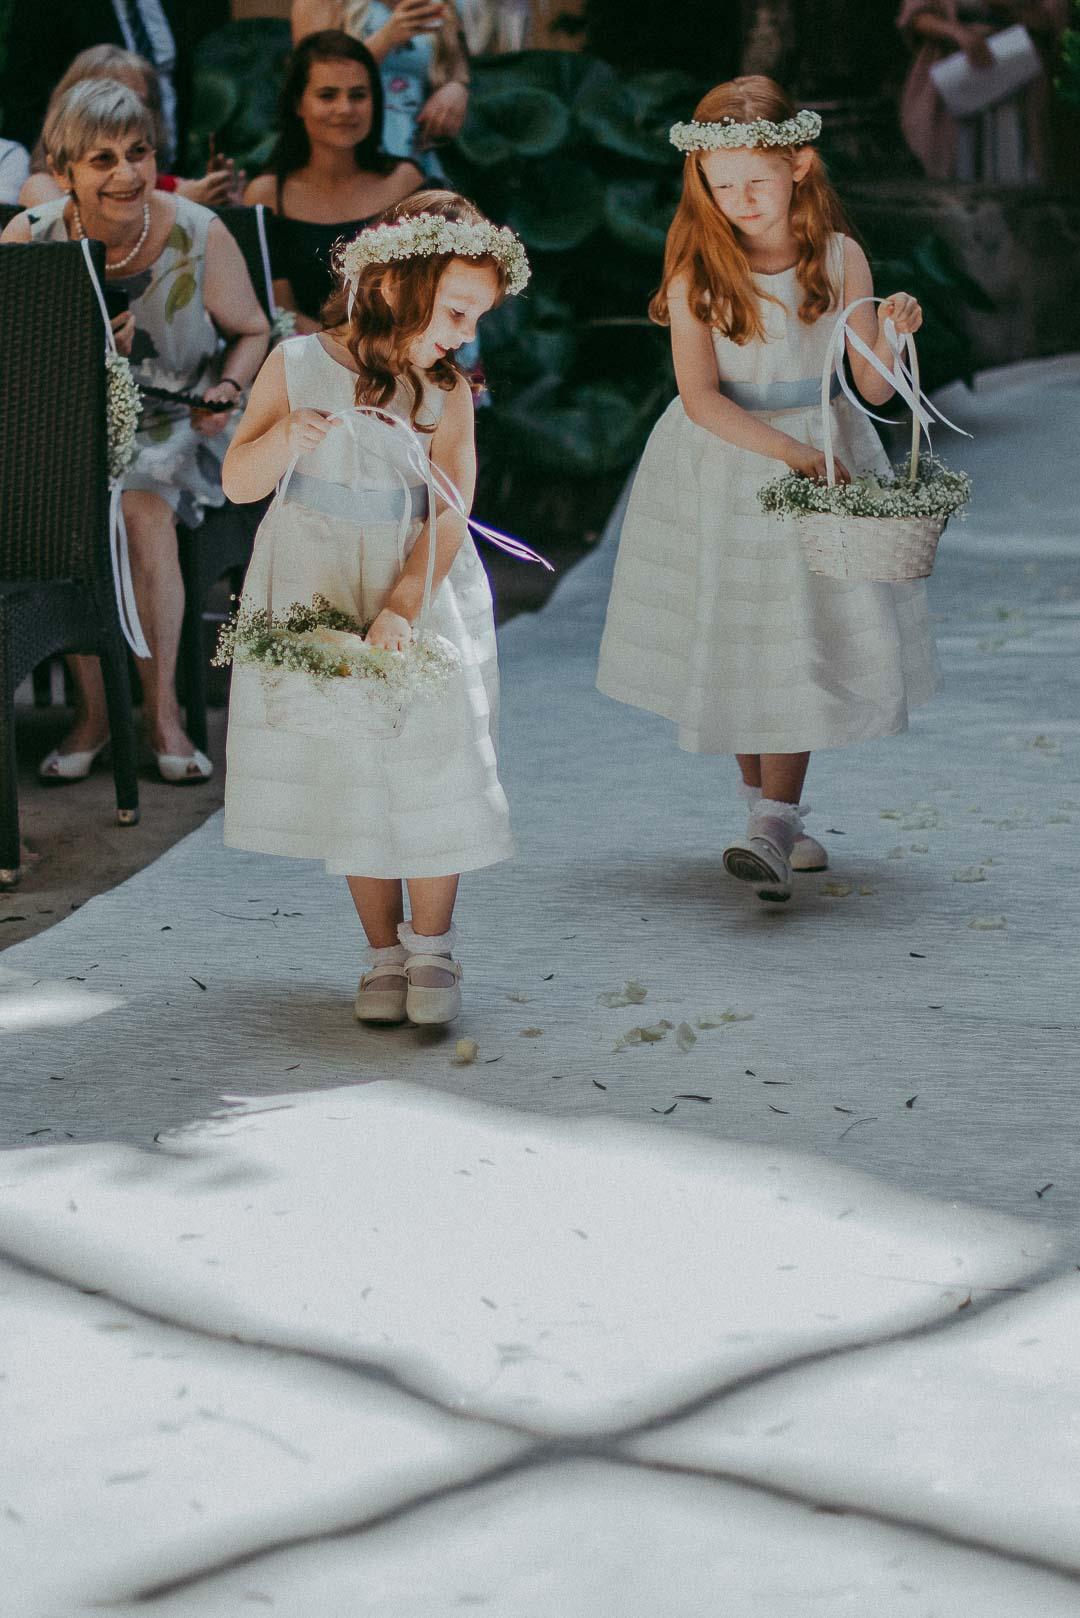 wedding-photographer-destination-fineart-bespoke-reportage-sorrento-parcodeiprincipi-vivianeizzo-spazio46-34